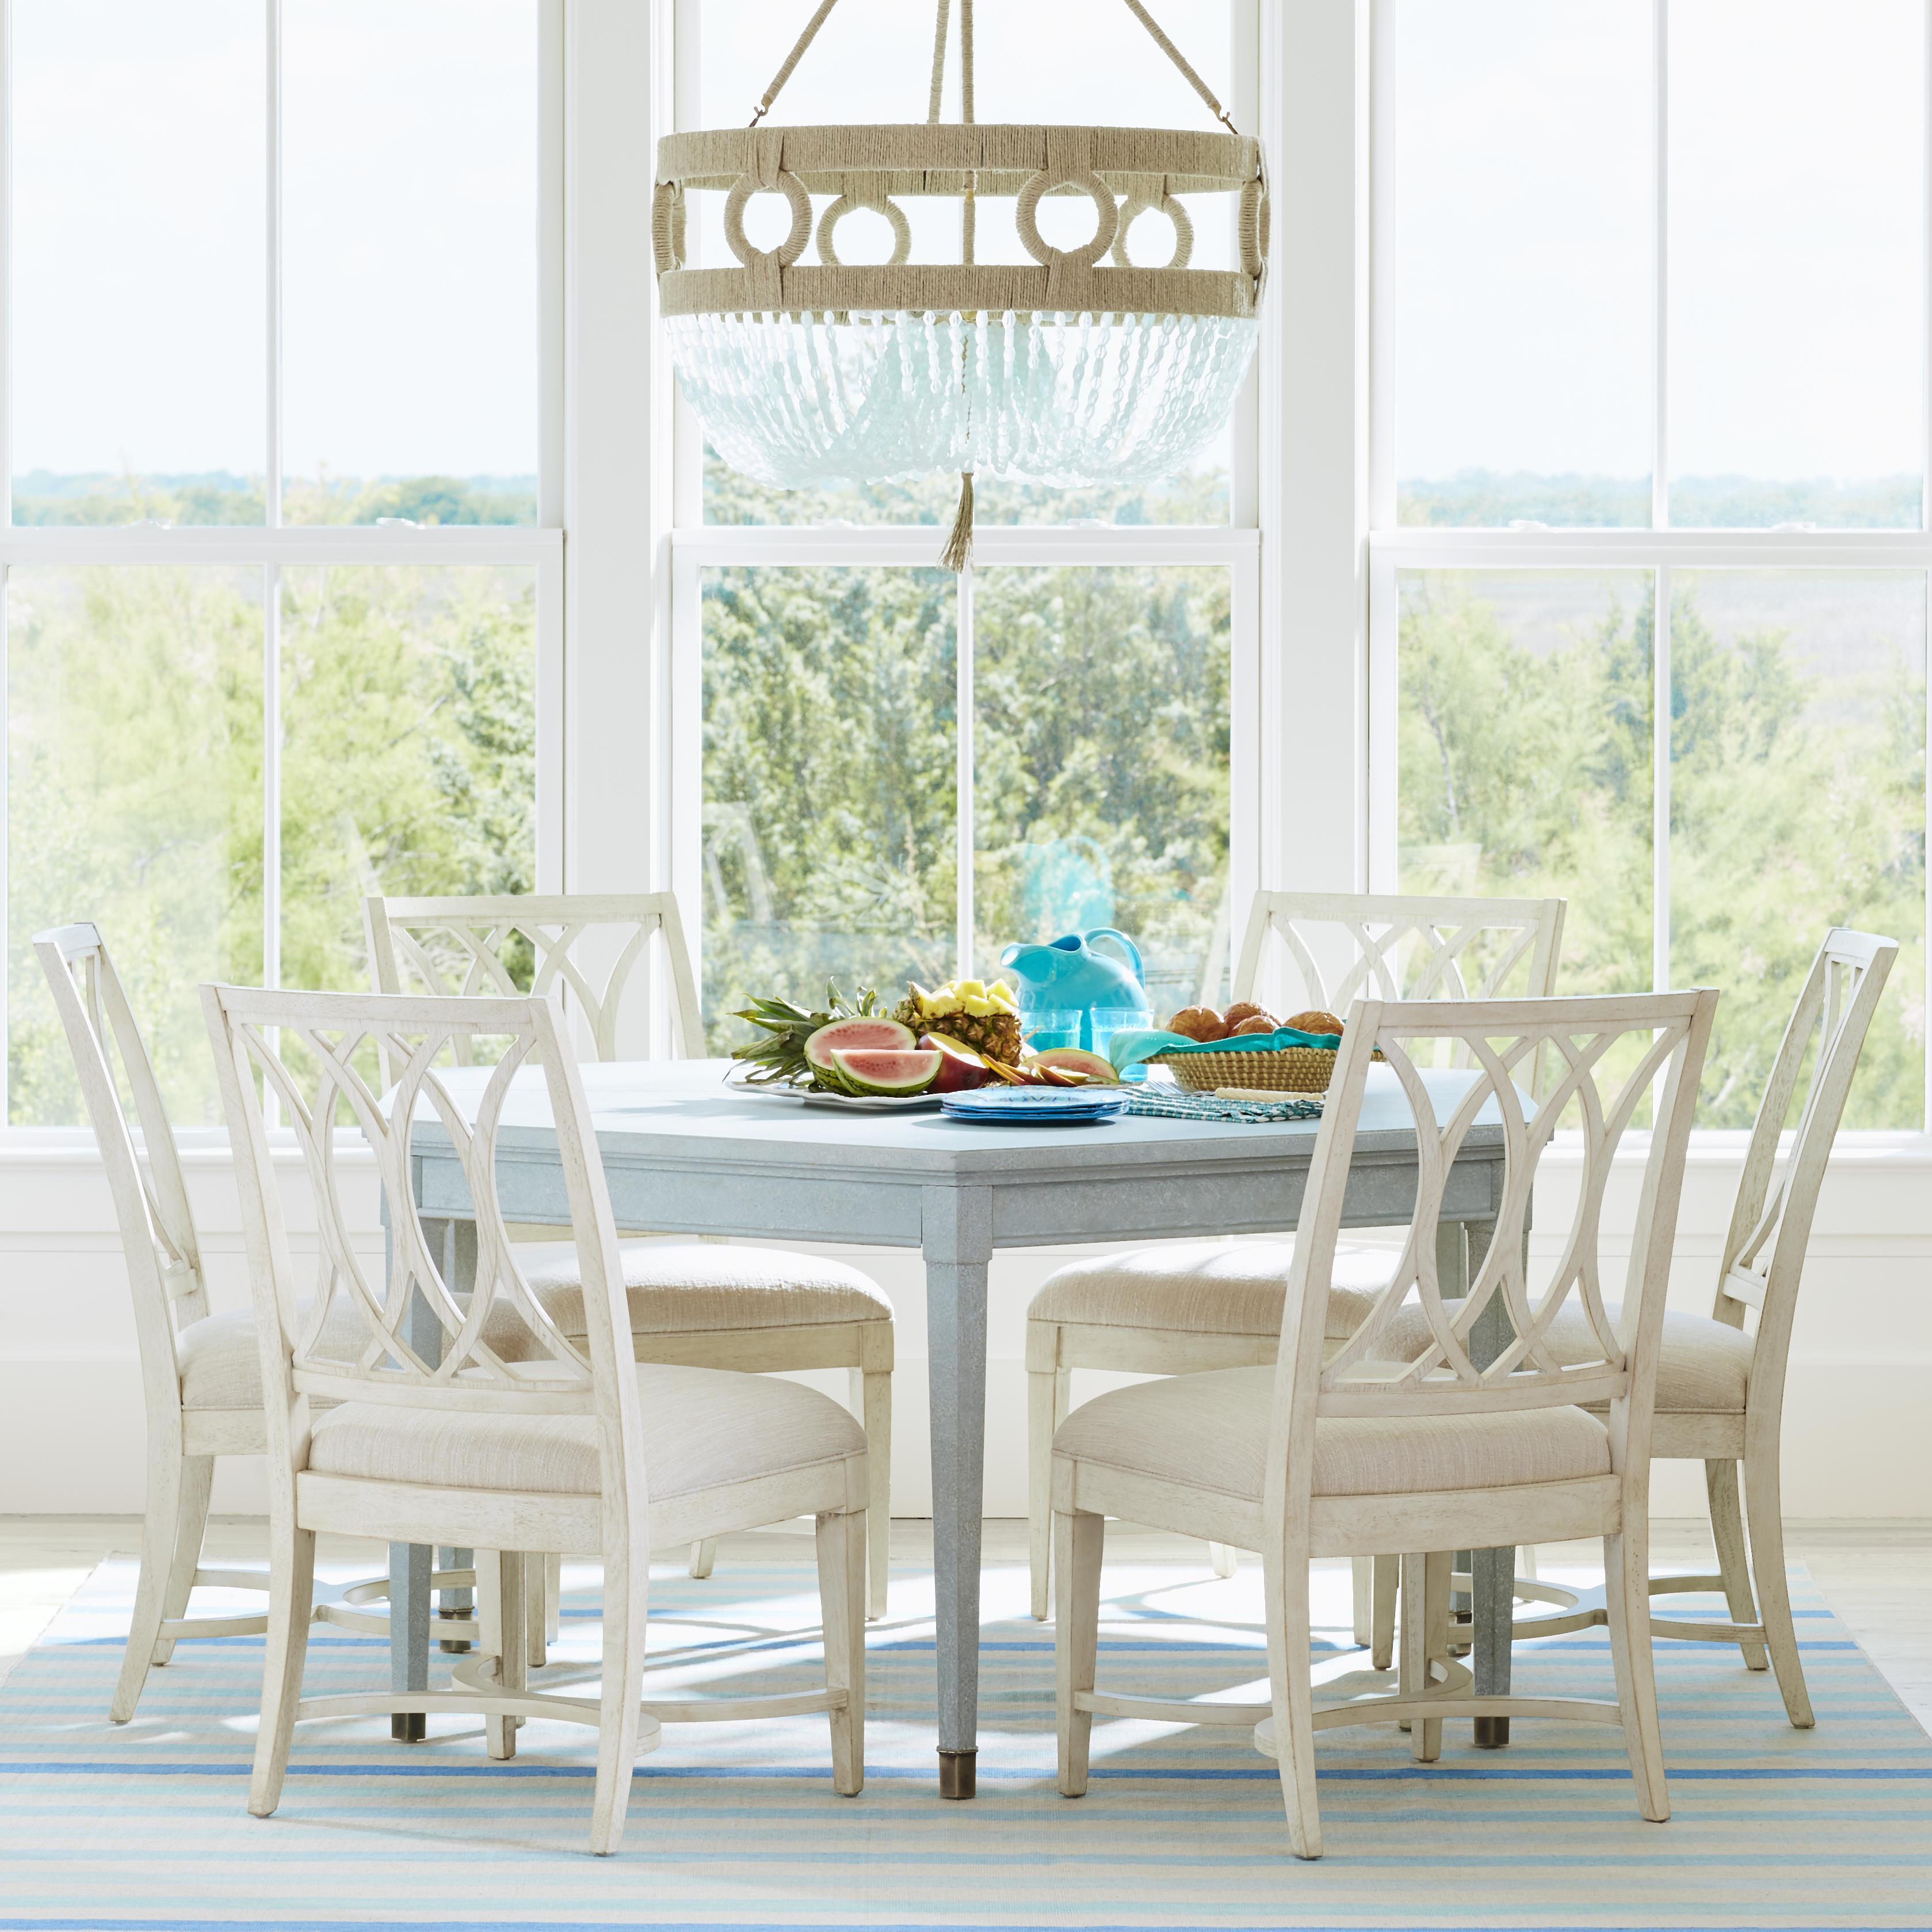 Stanley Furniture Coastal Living Resort 7 Piece Soledad Promenade Table & Chair Set - Item Number: 062-H1-32+6xA1-60